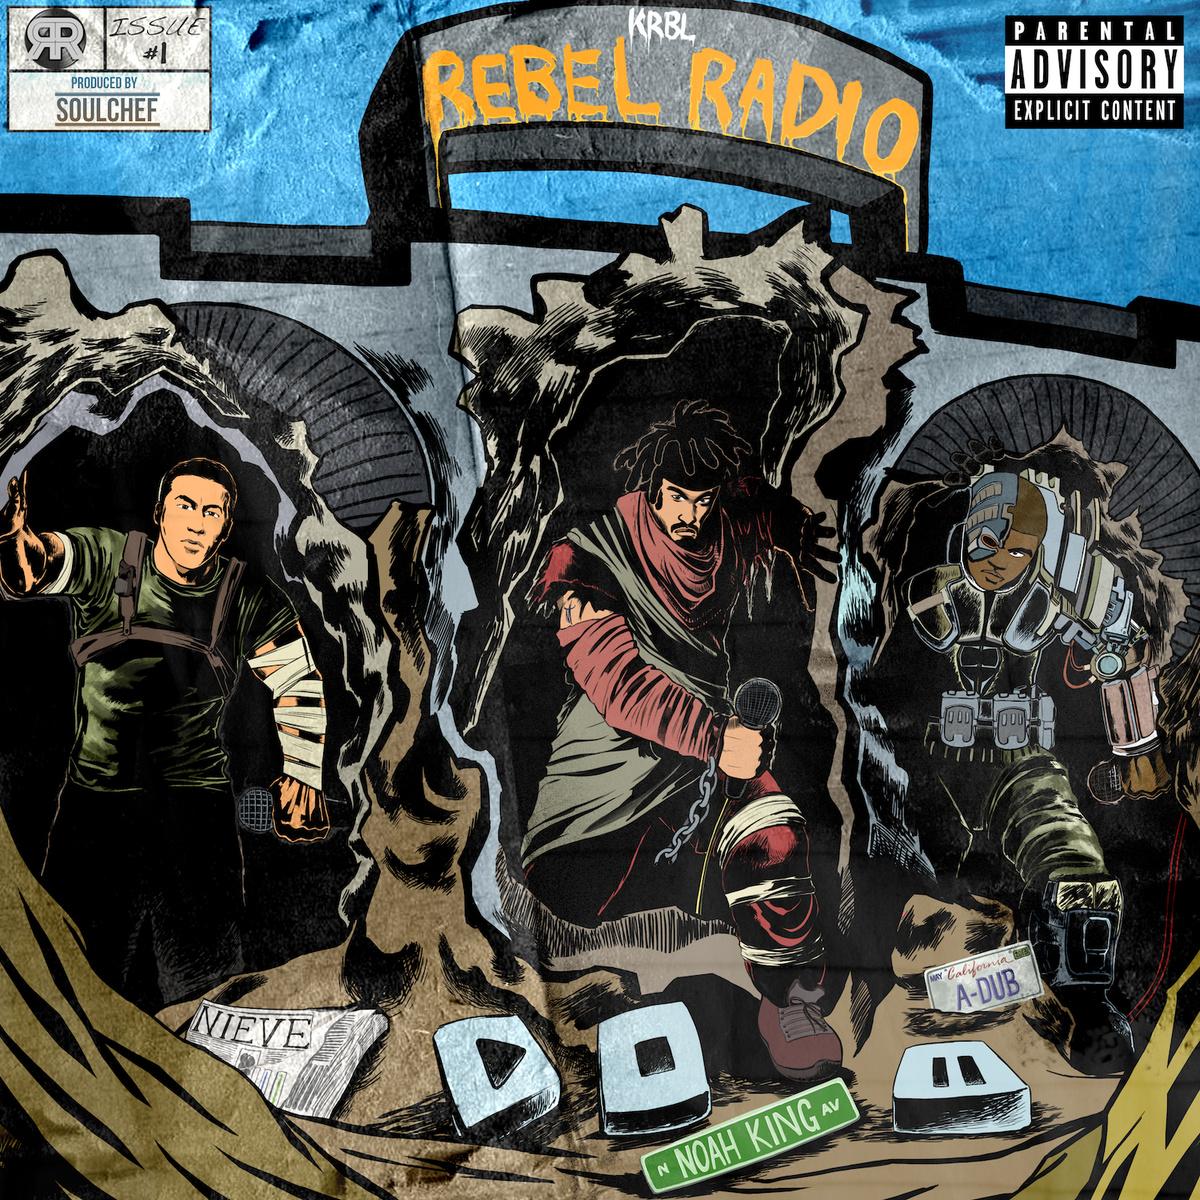 KRBL Rebel Radio